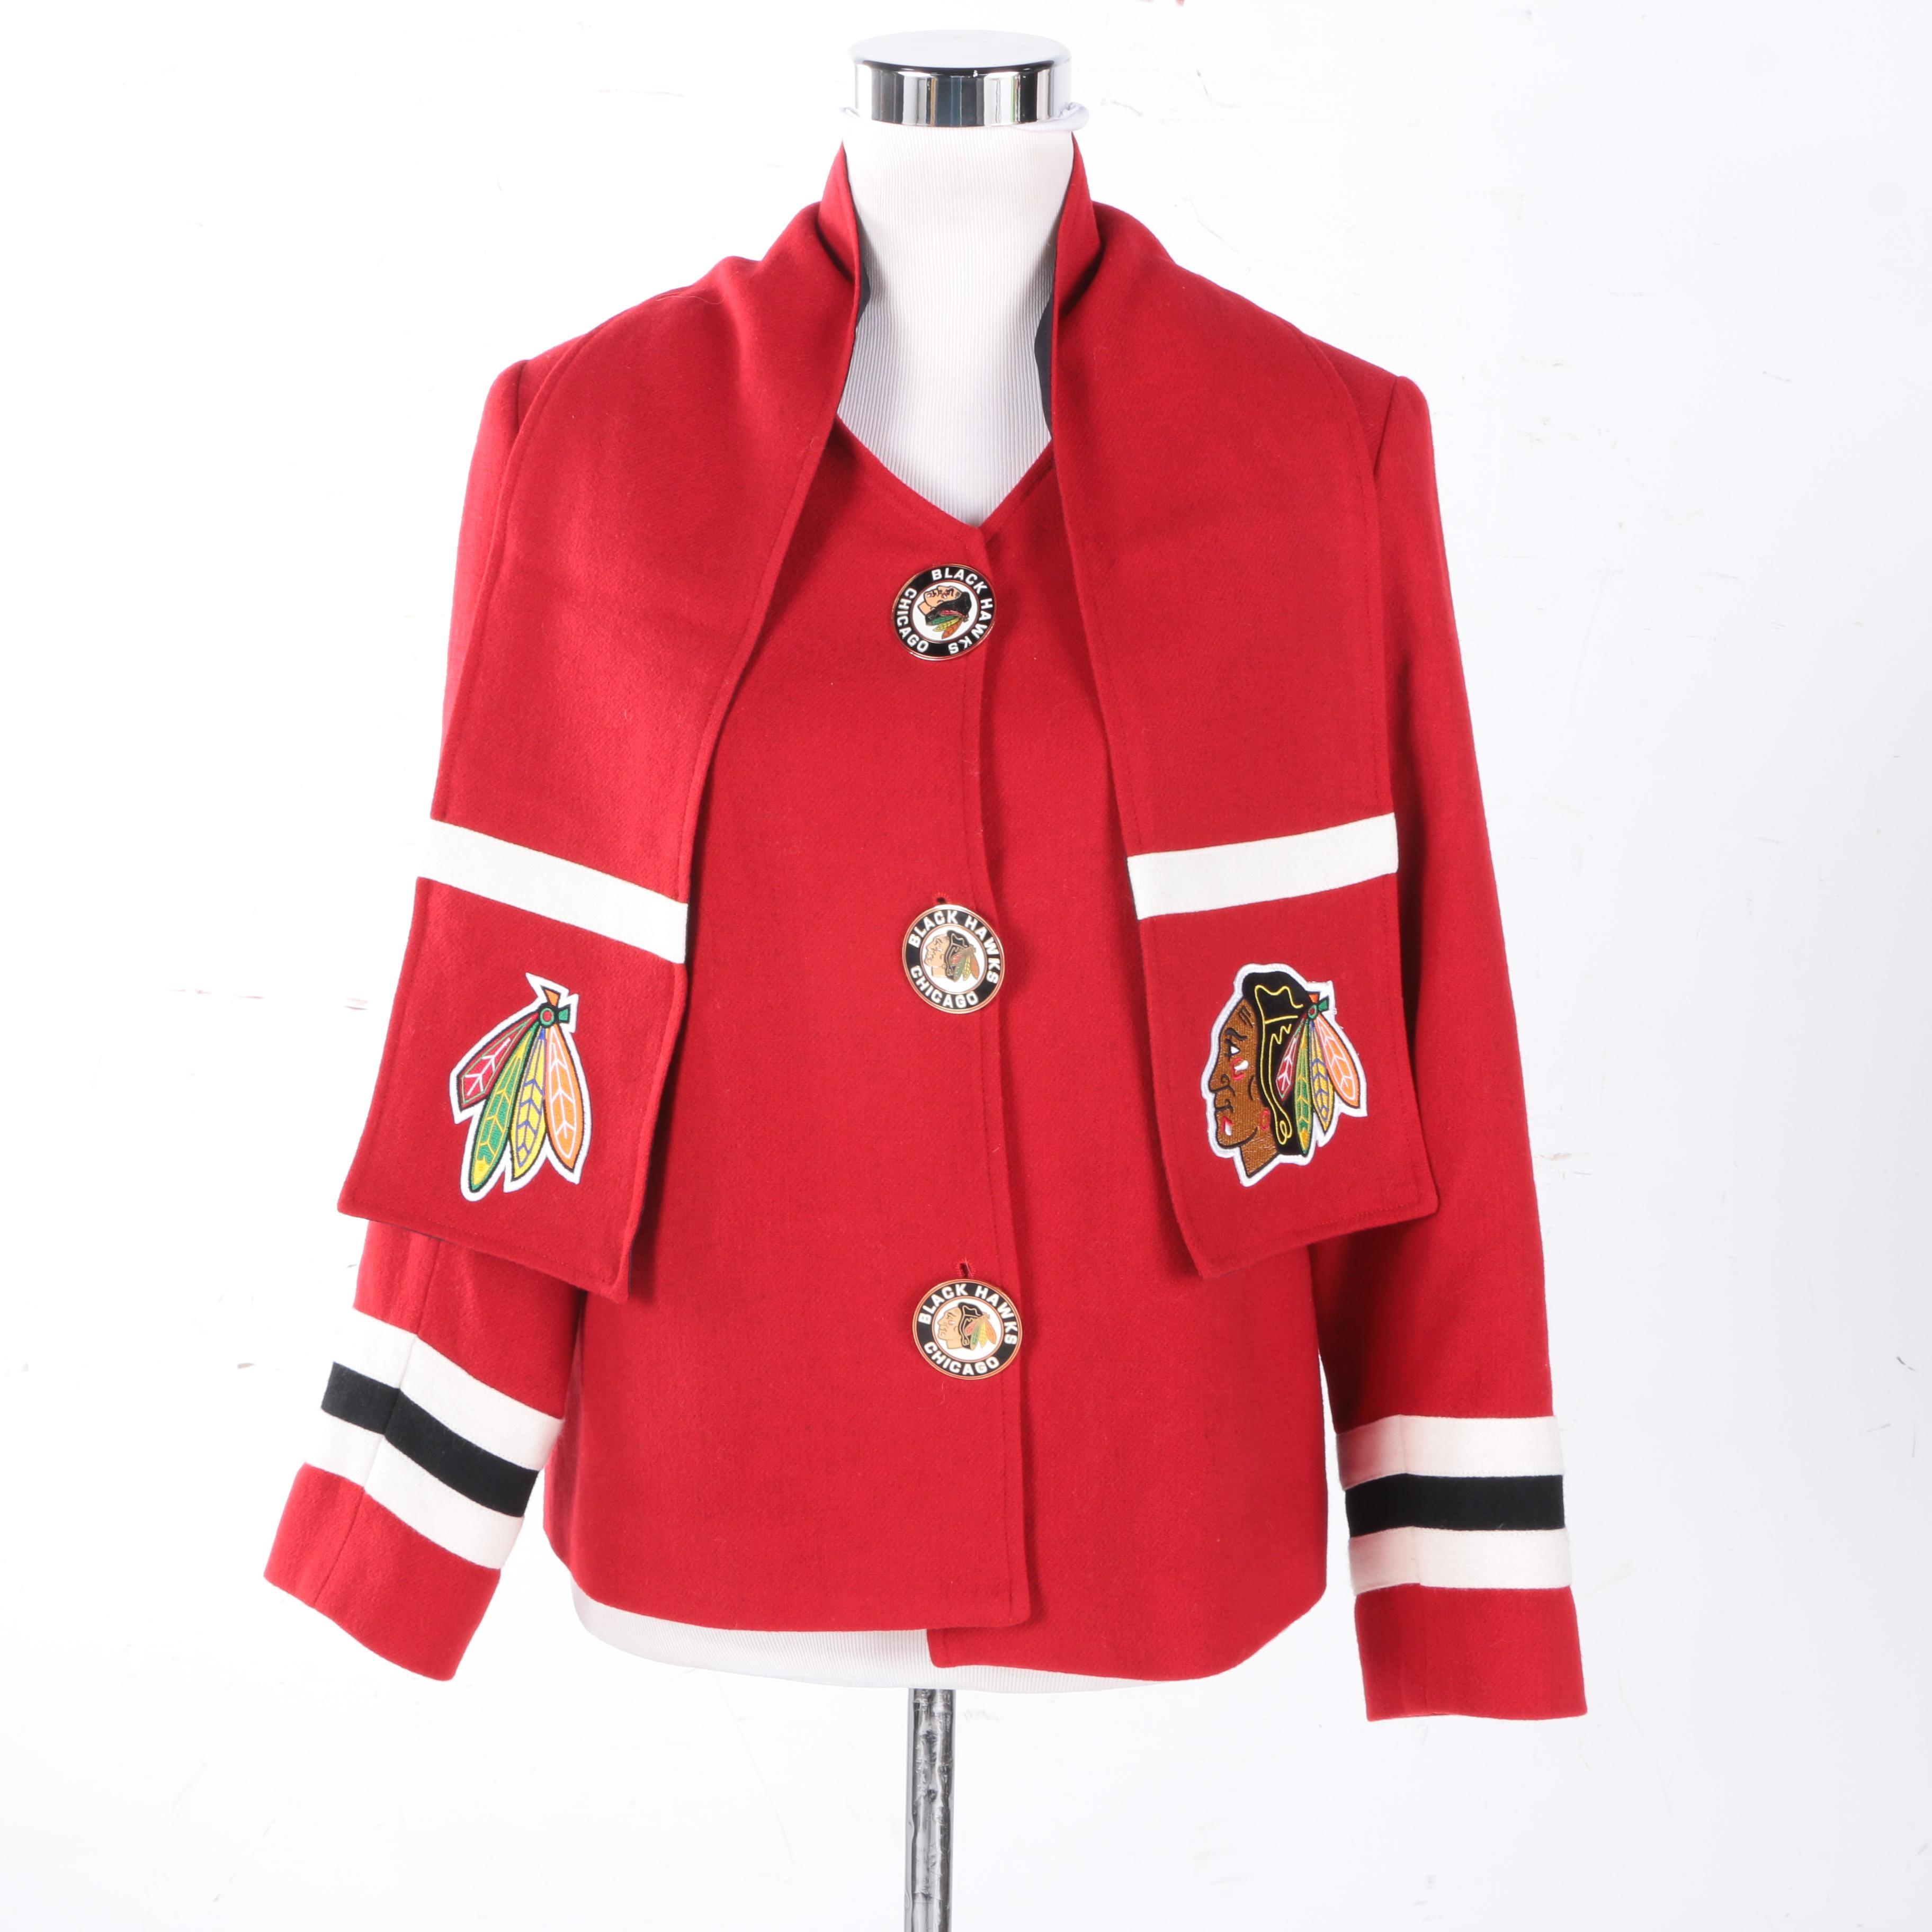 Chicago Blackhawks Coat and Scarf